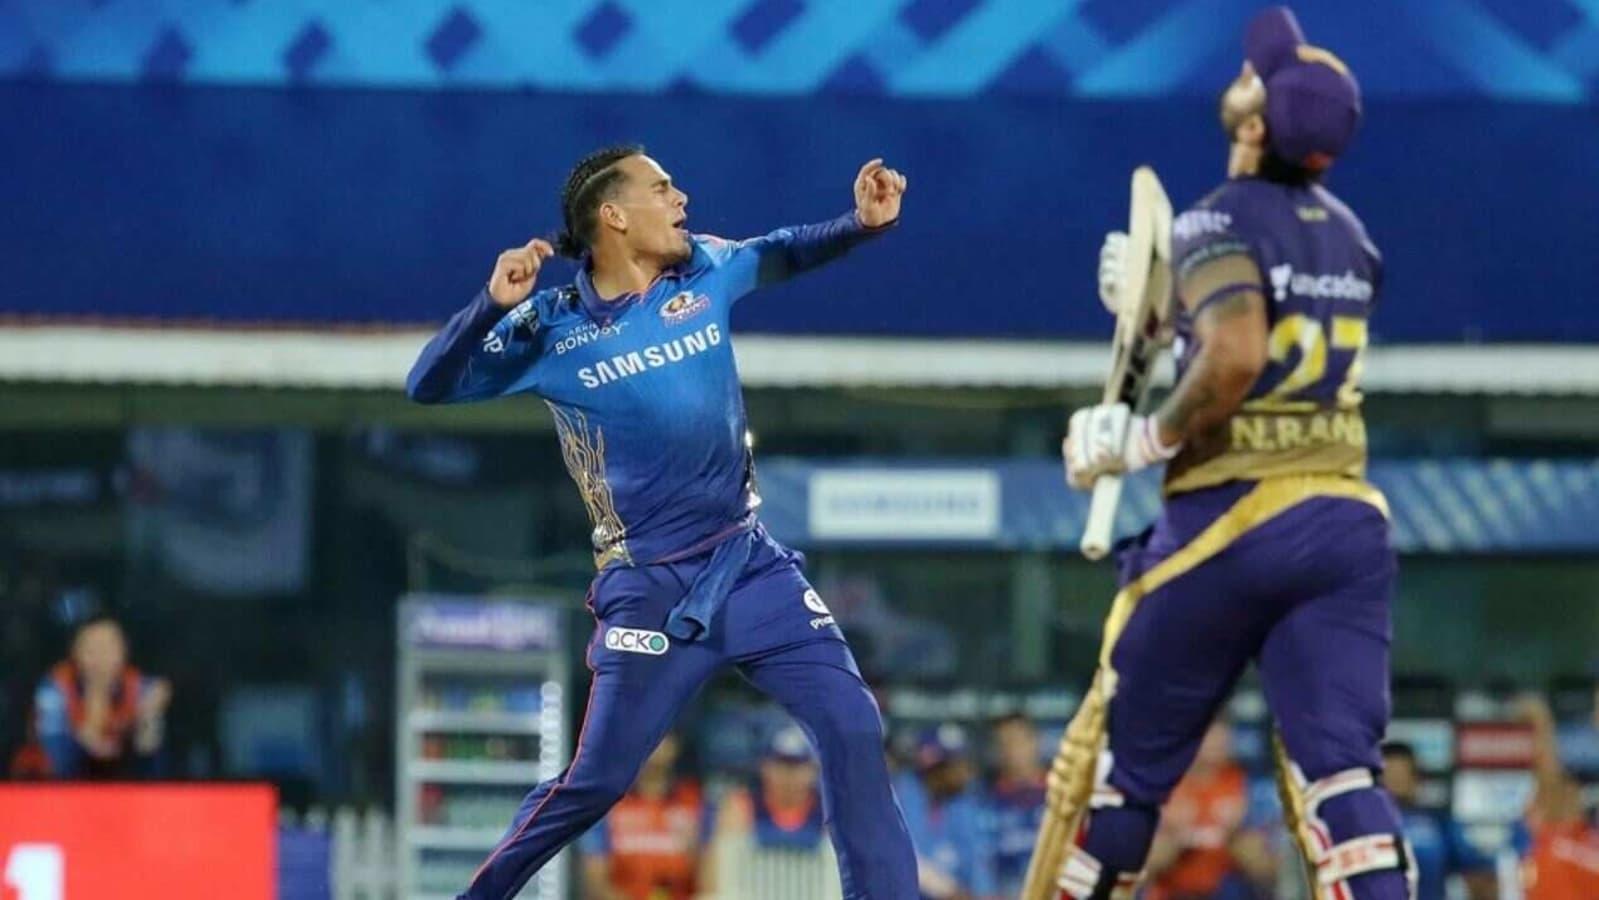 IPL 2021 KKR vs MI Highlights: Mumbai Indians beat Kolkata Knight Riders by 10 runs | Hindustan Times